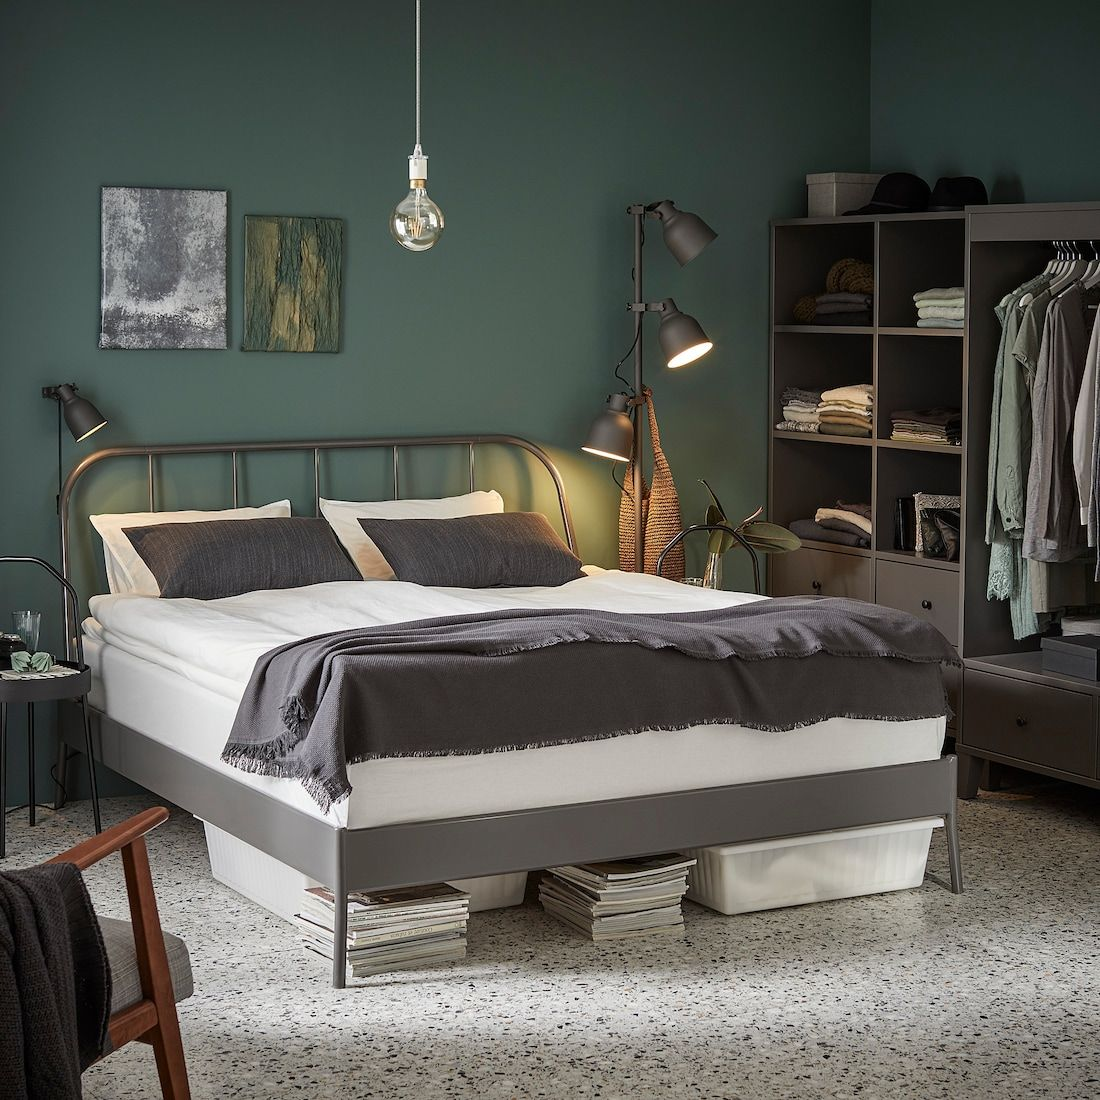 Kopardal Bed Frame Gray Lur 246 Y Queen In 2020 Bed Frame Bed Slats Bed